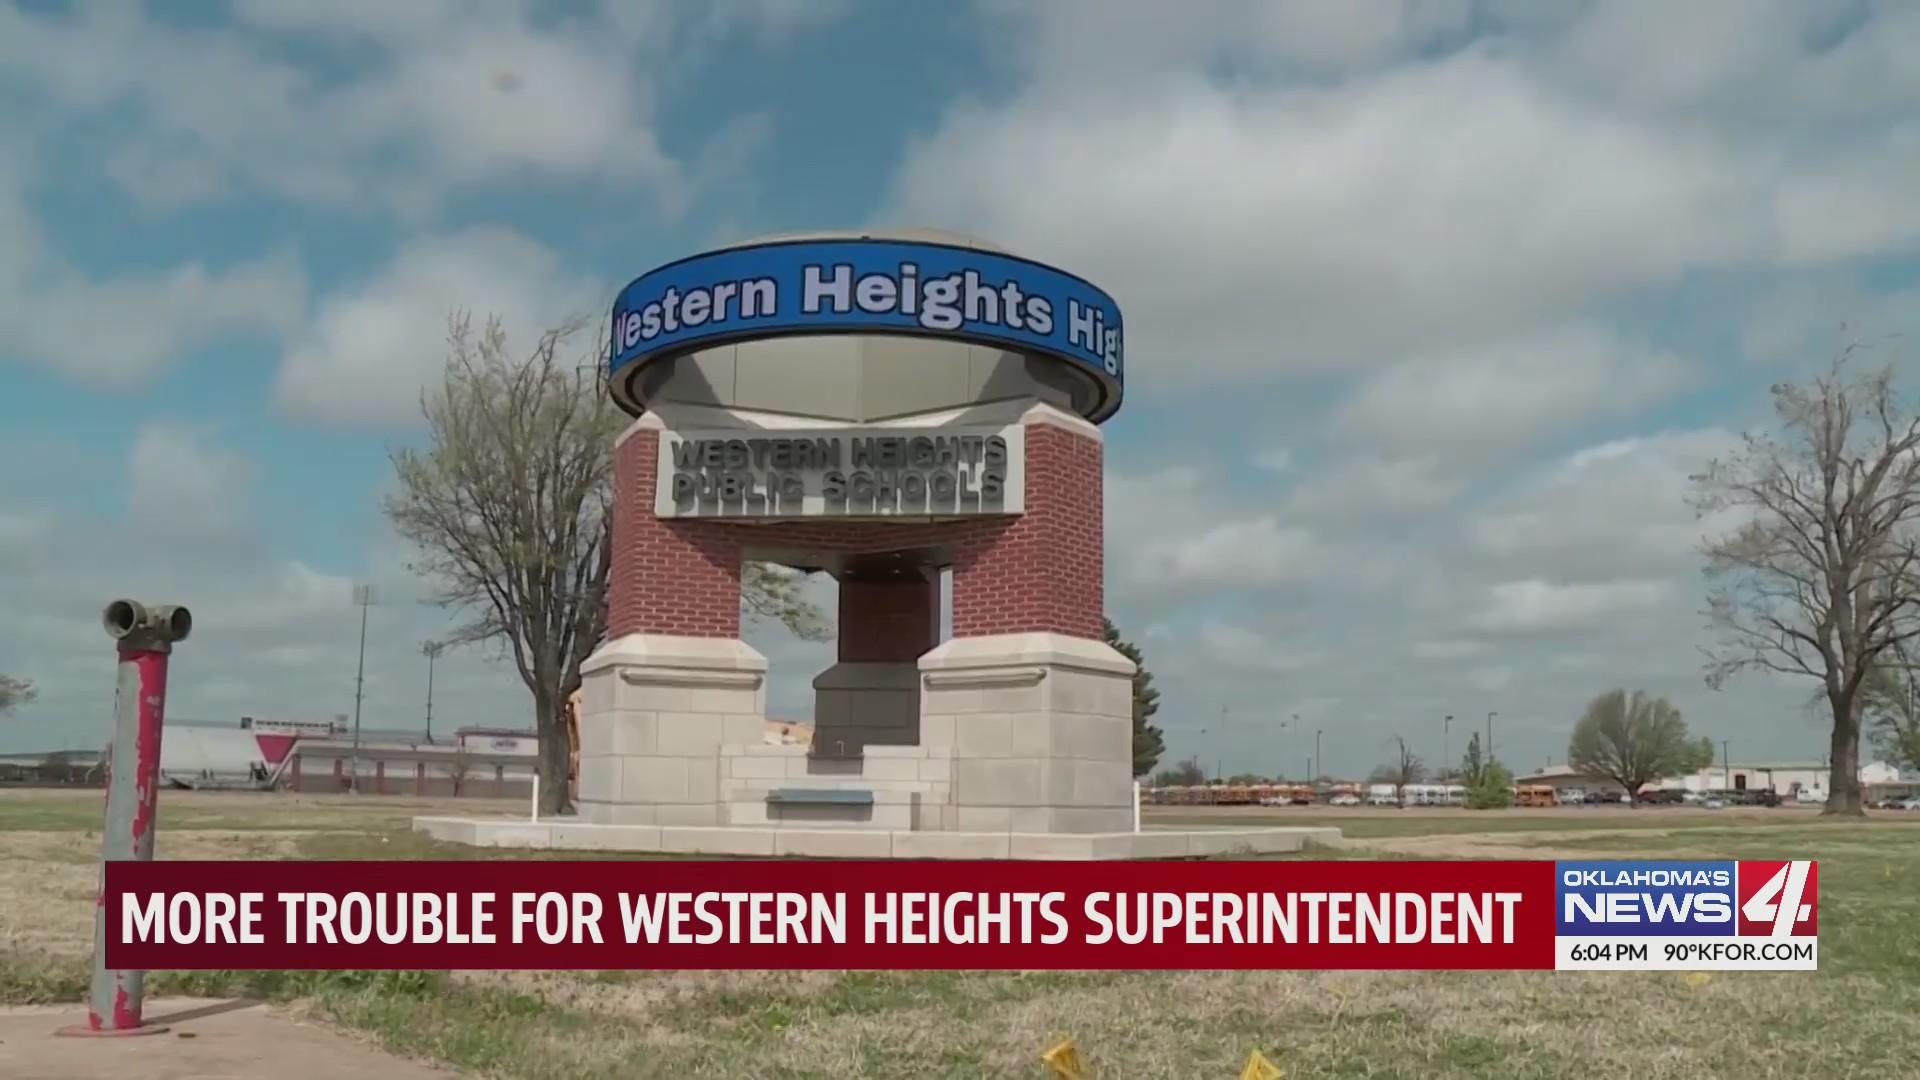 Western Heights school sign